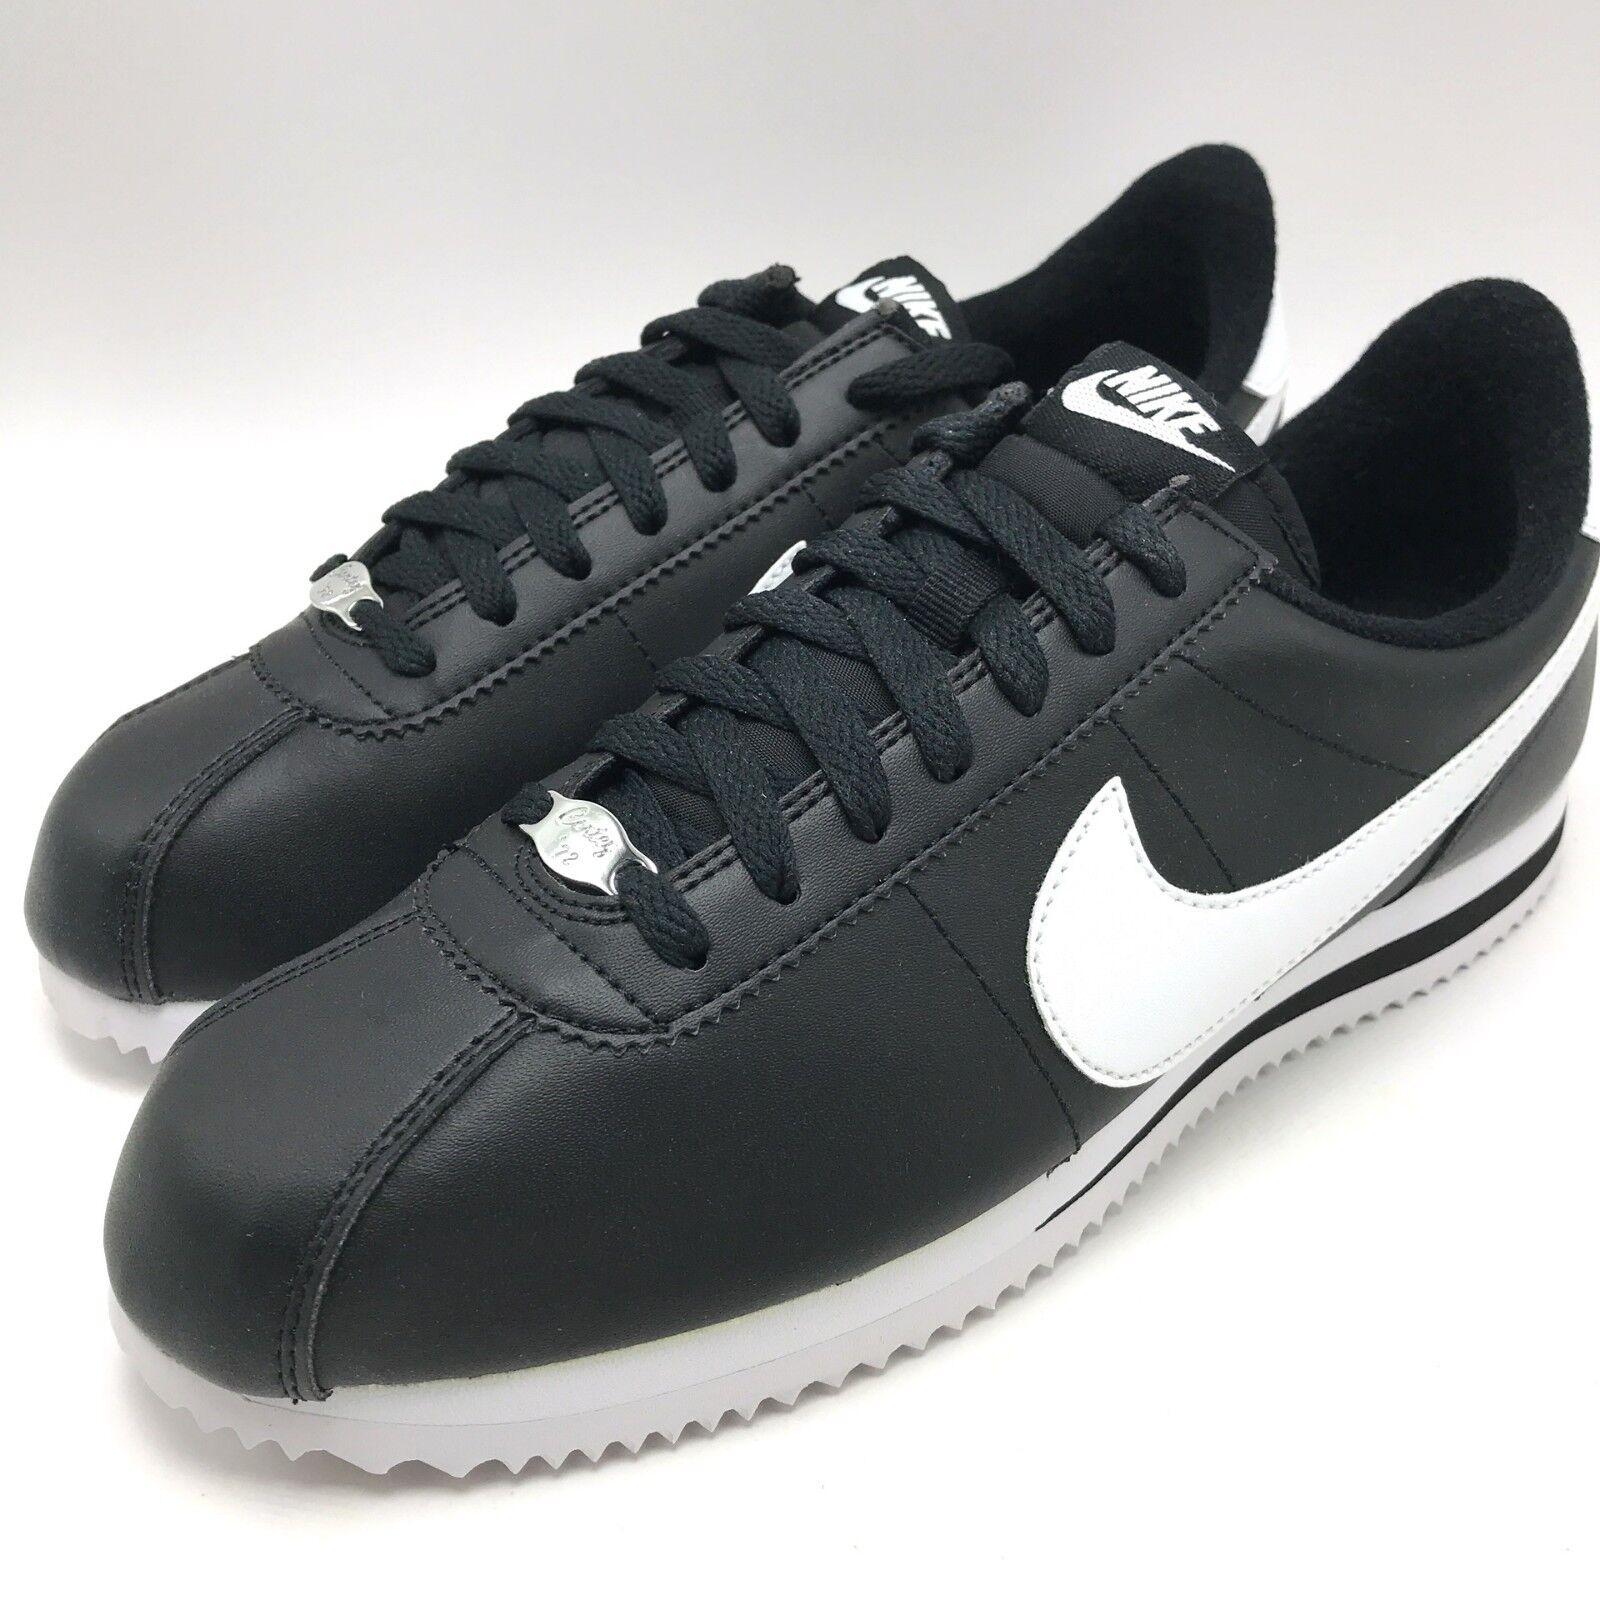 Nike Cortez Basic Leather Men's shoes Black White-Metallic Silver 819719-012